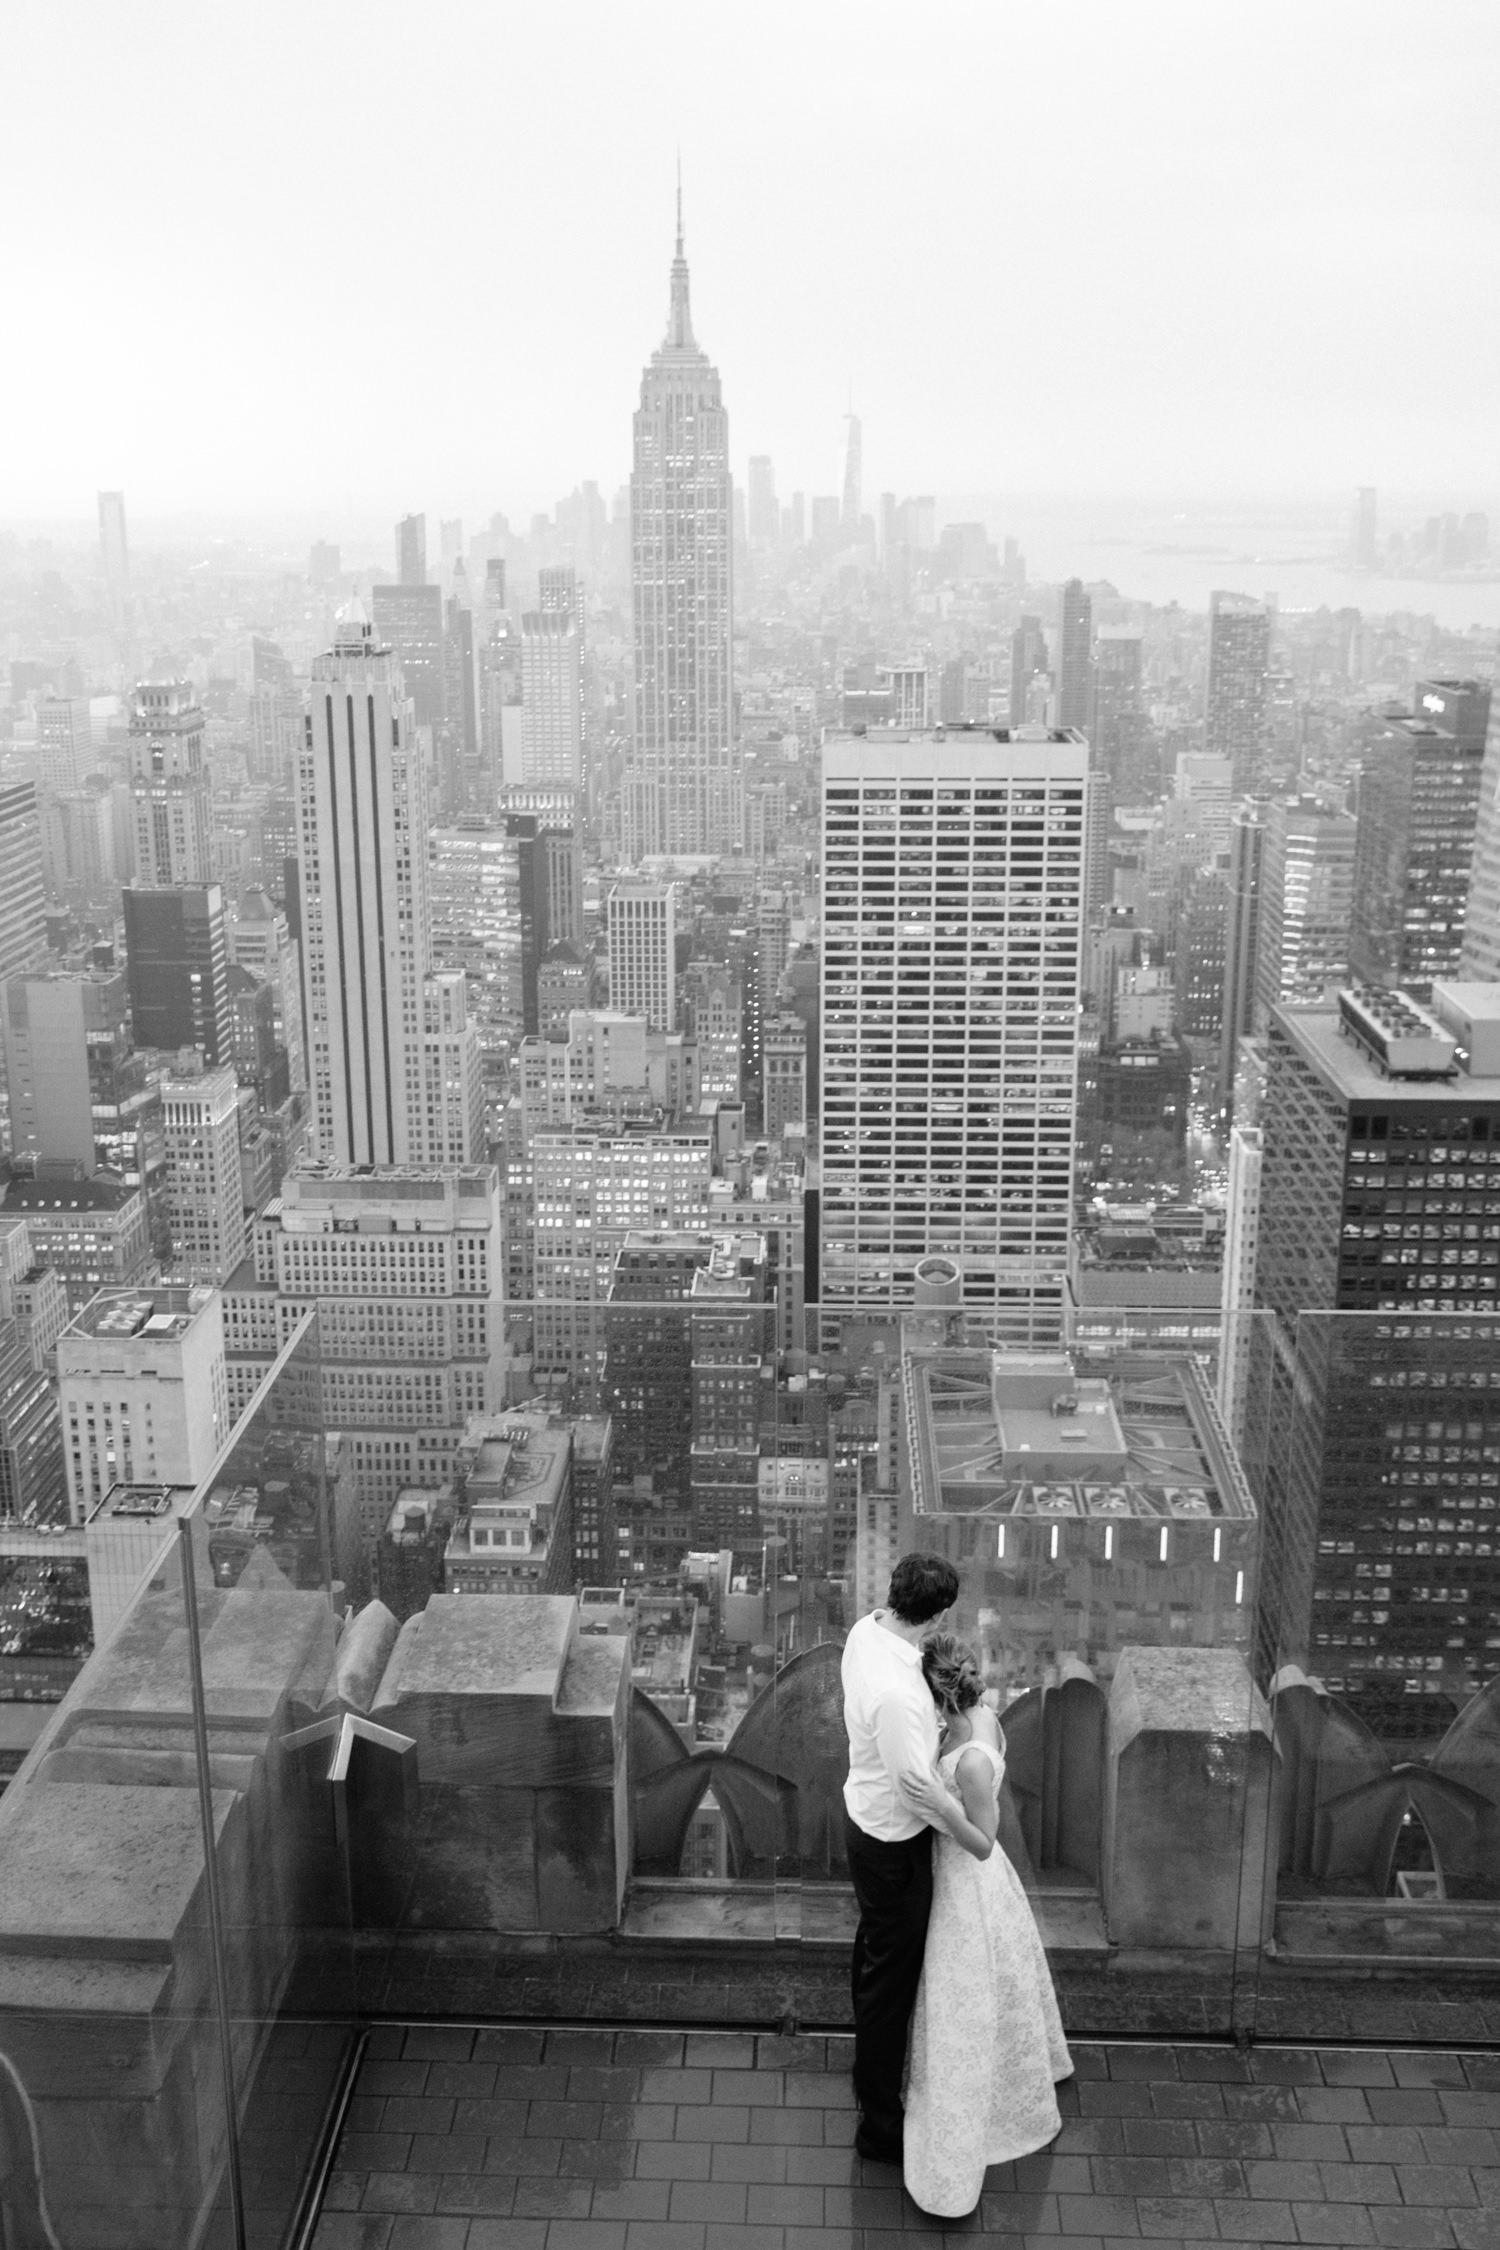 NYC-Top-of-the-Rock-wedding-photos-L&B-16.jpg